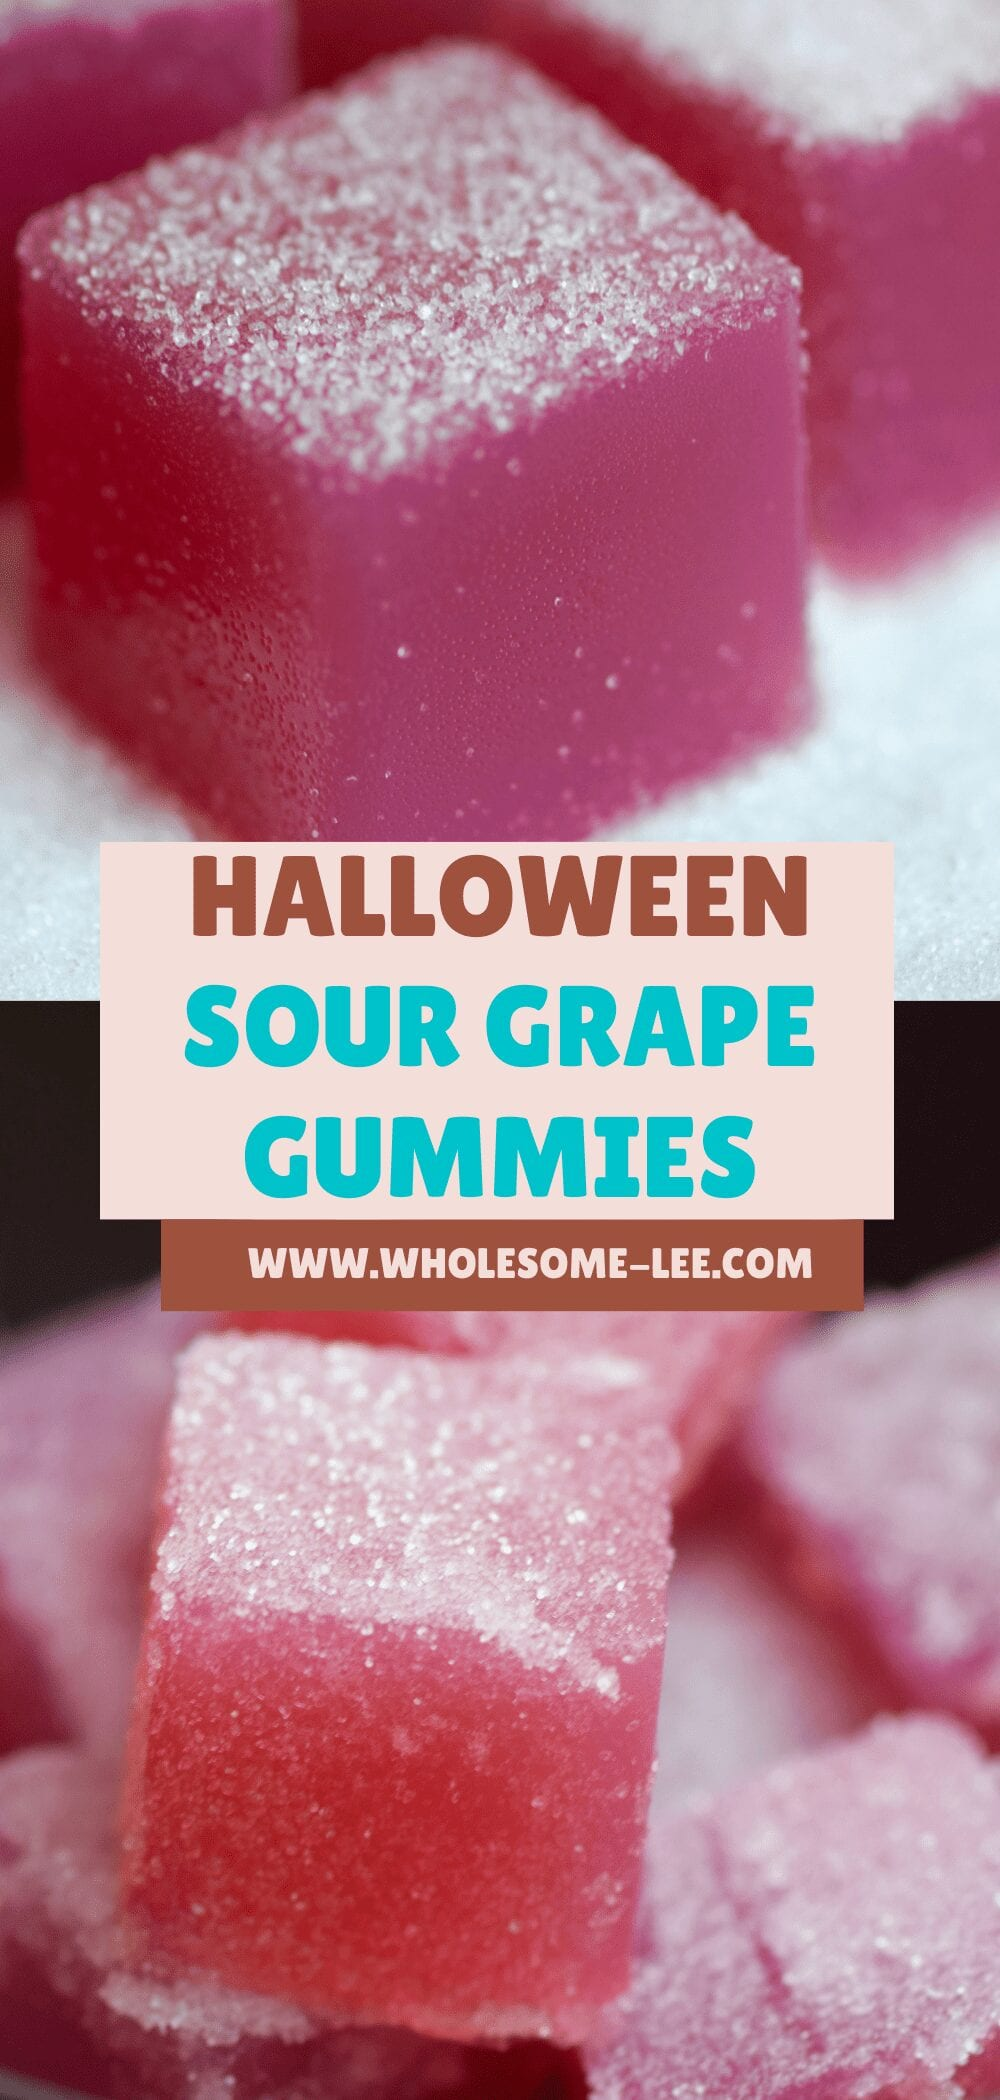 Halloween sour grape gummies